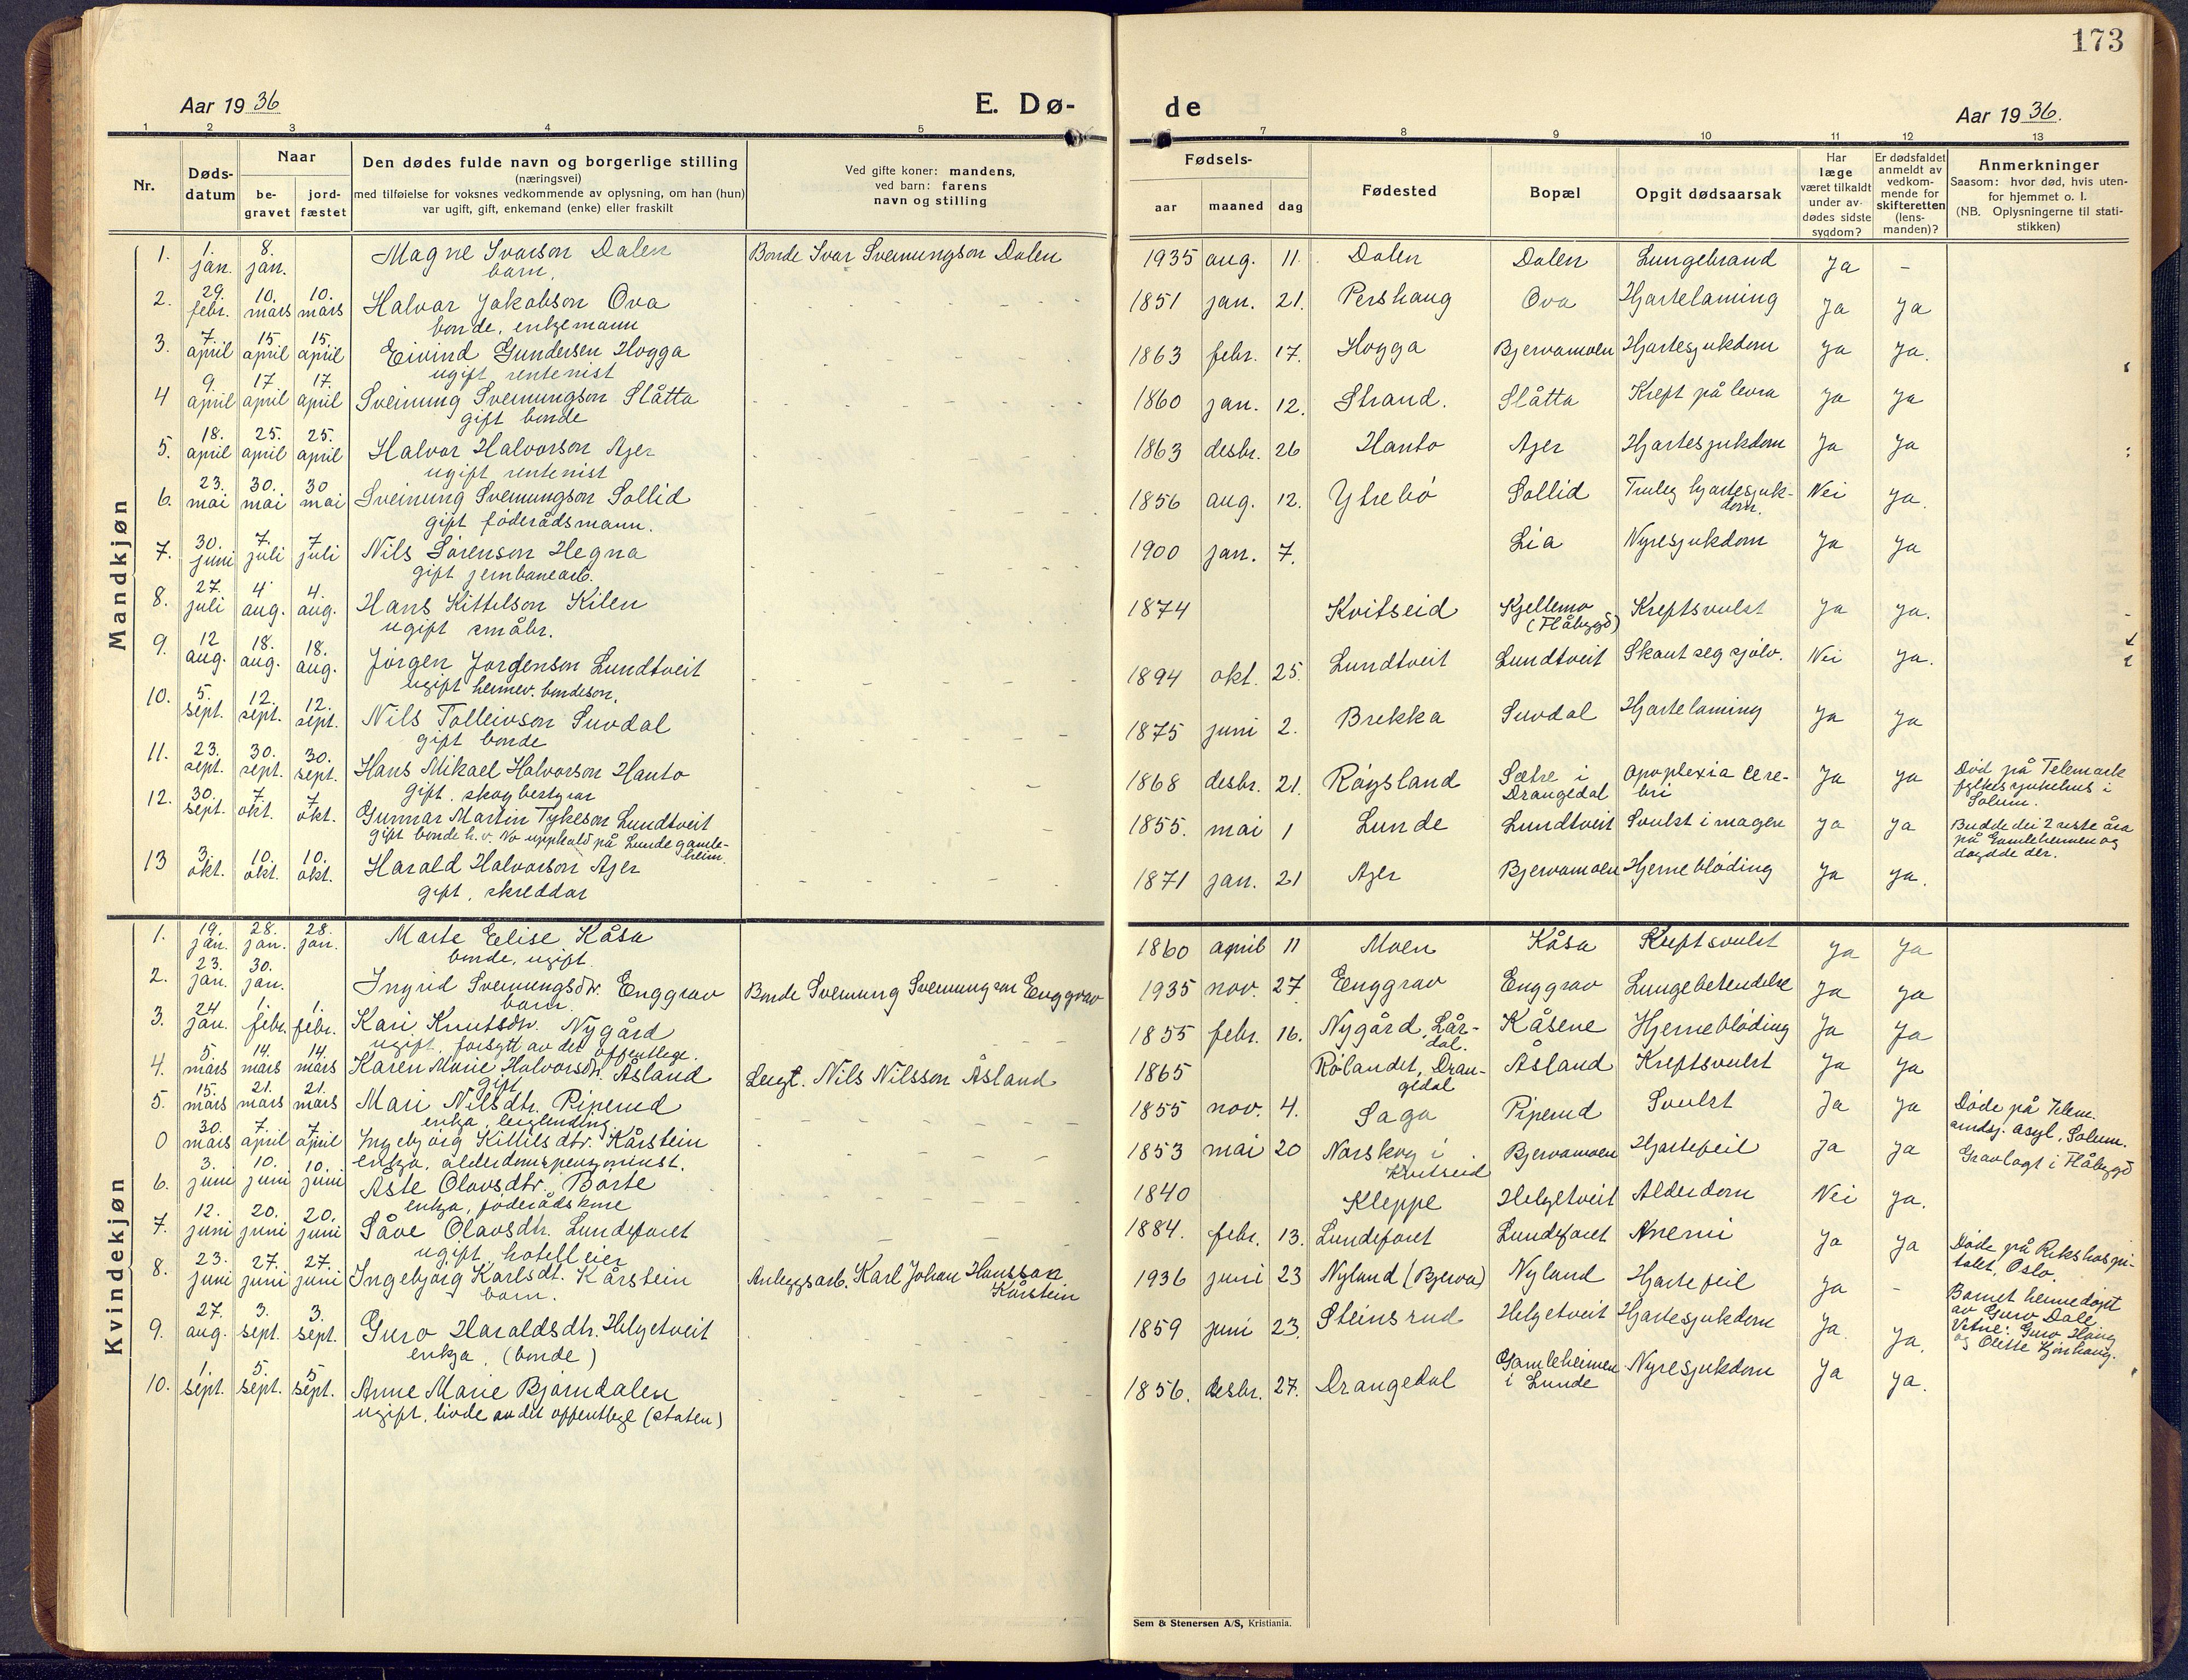 SAKO, Lunde kirkebøker, F/Fa/L0006: Ministerialbok nr. I 6, 1922-1940, s. 173